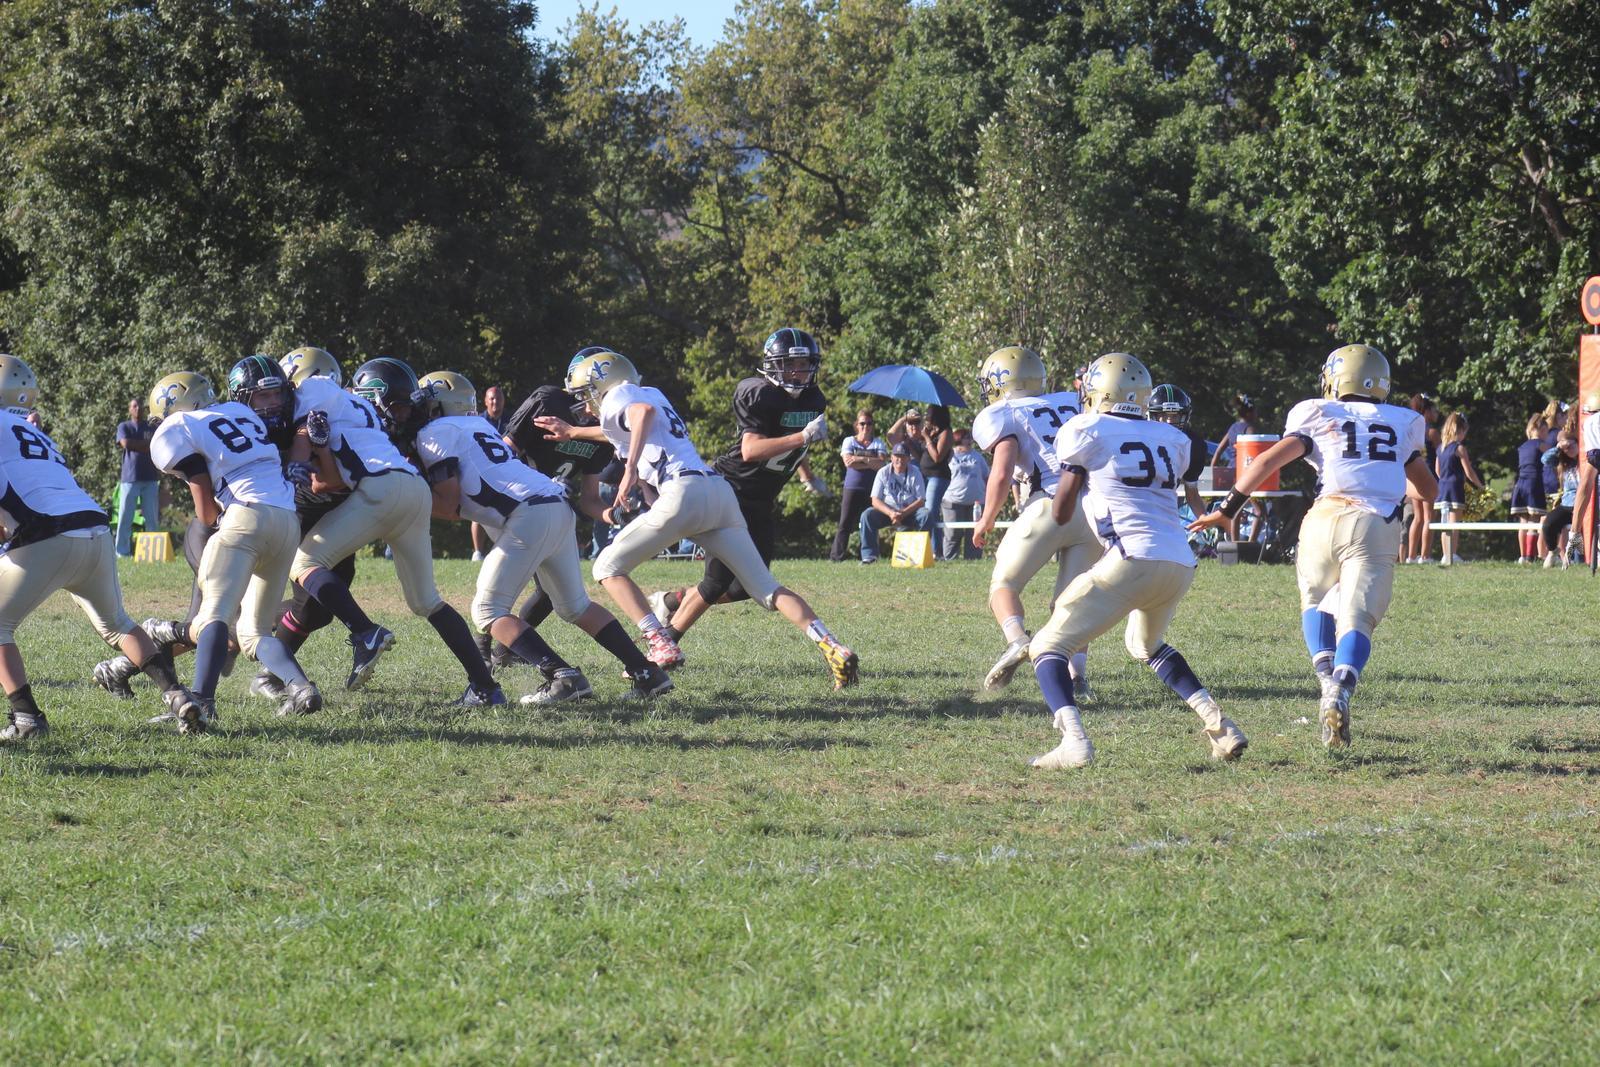 Harrisburg packers midget football teams — photo 4